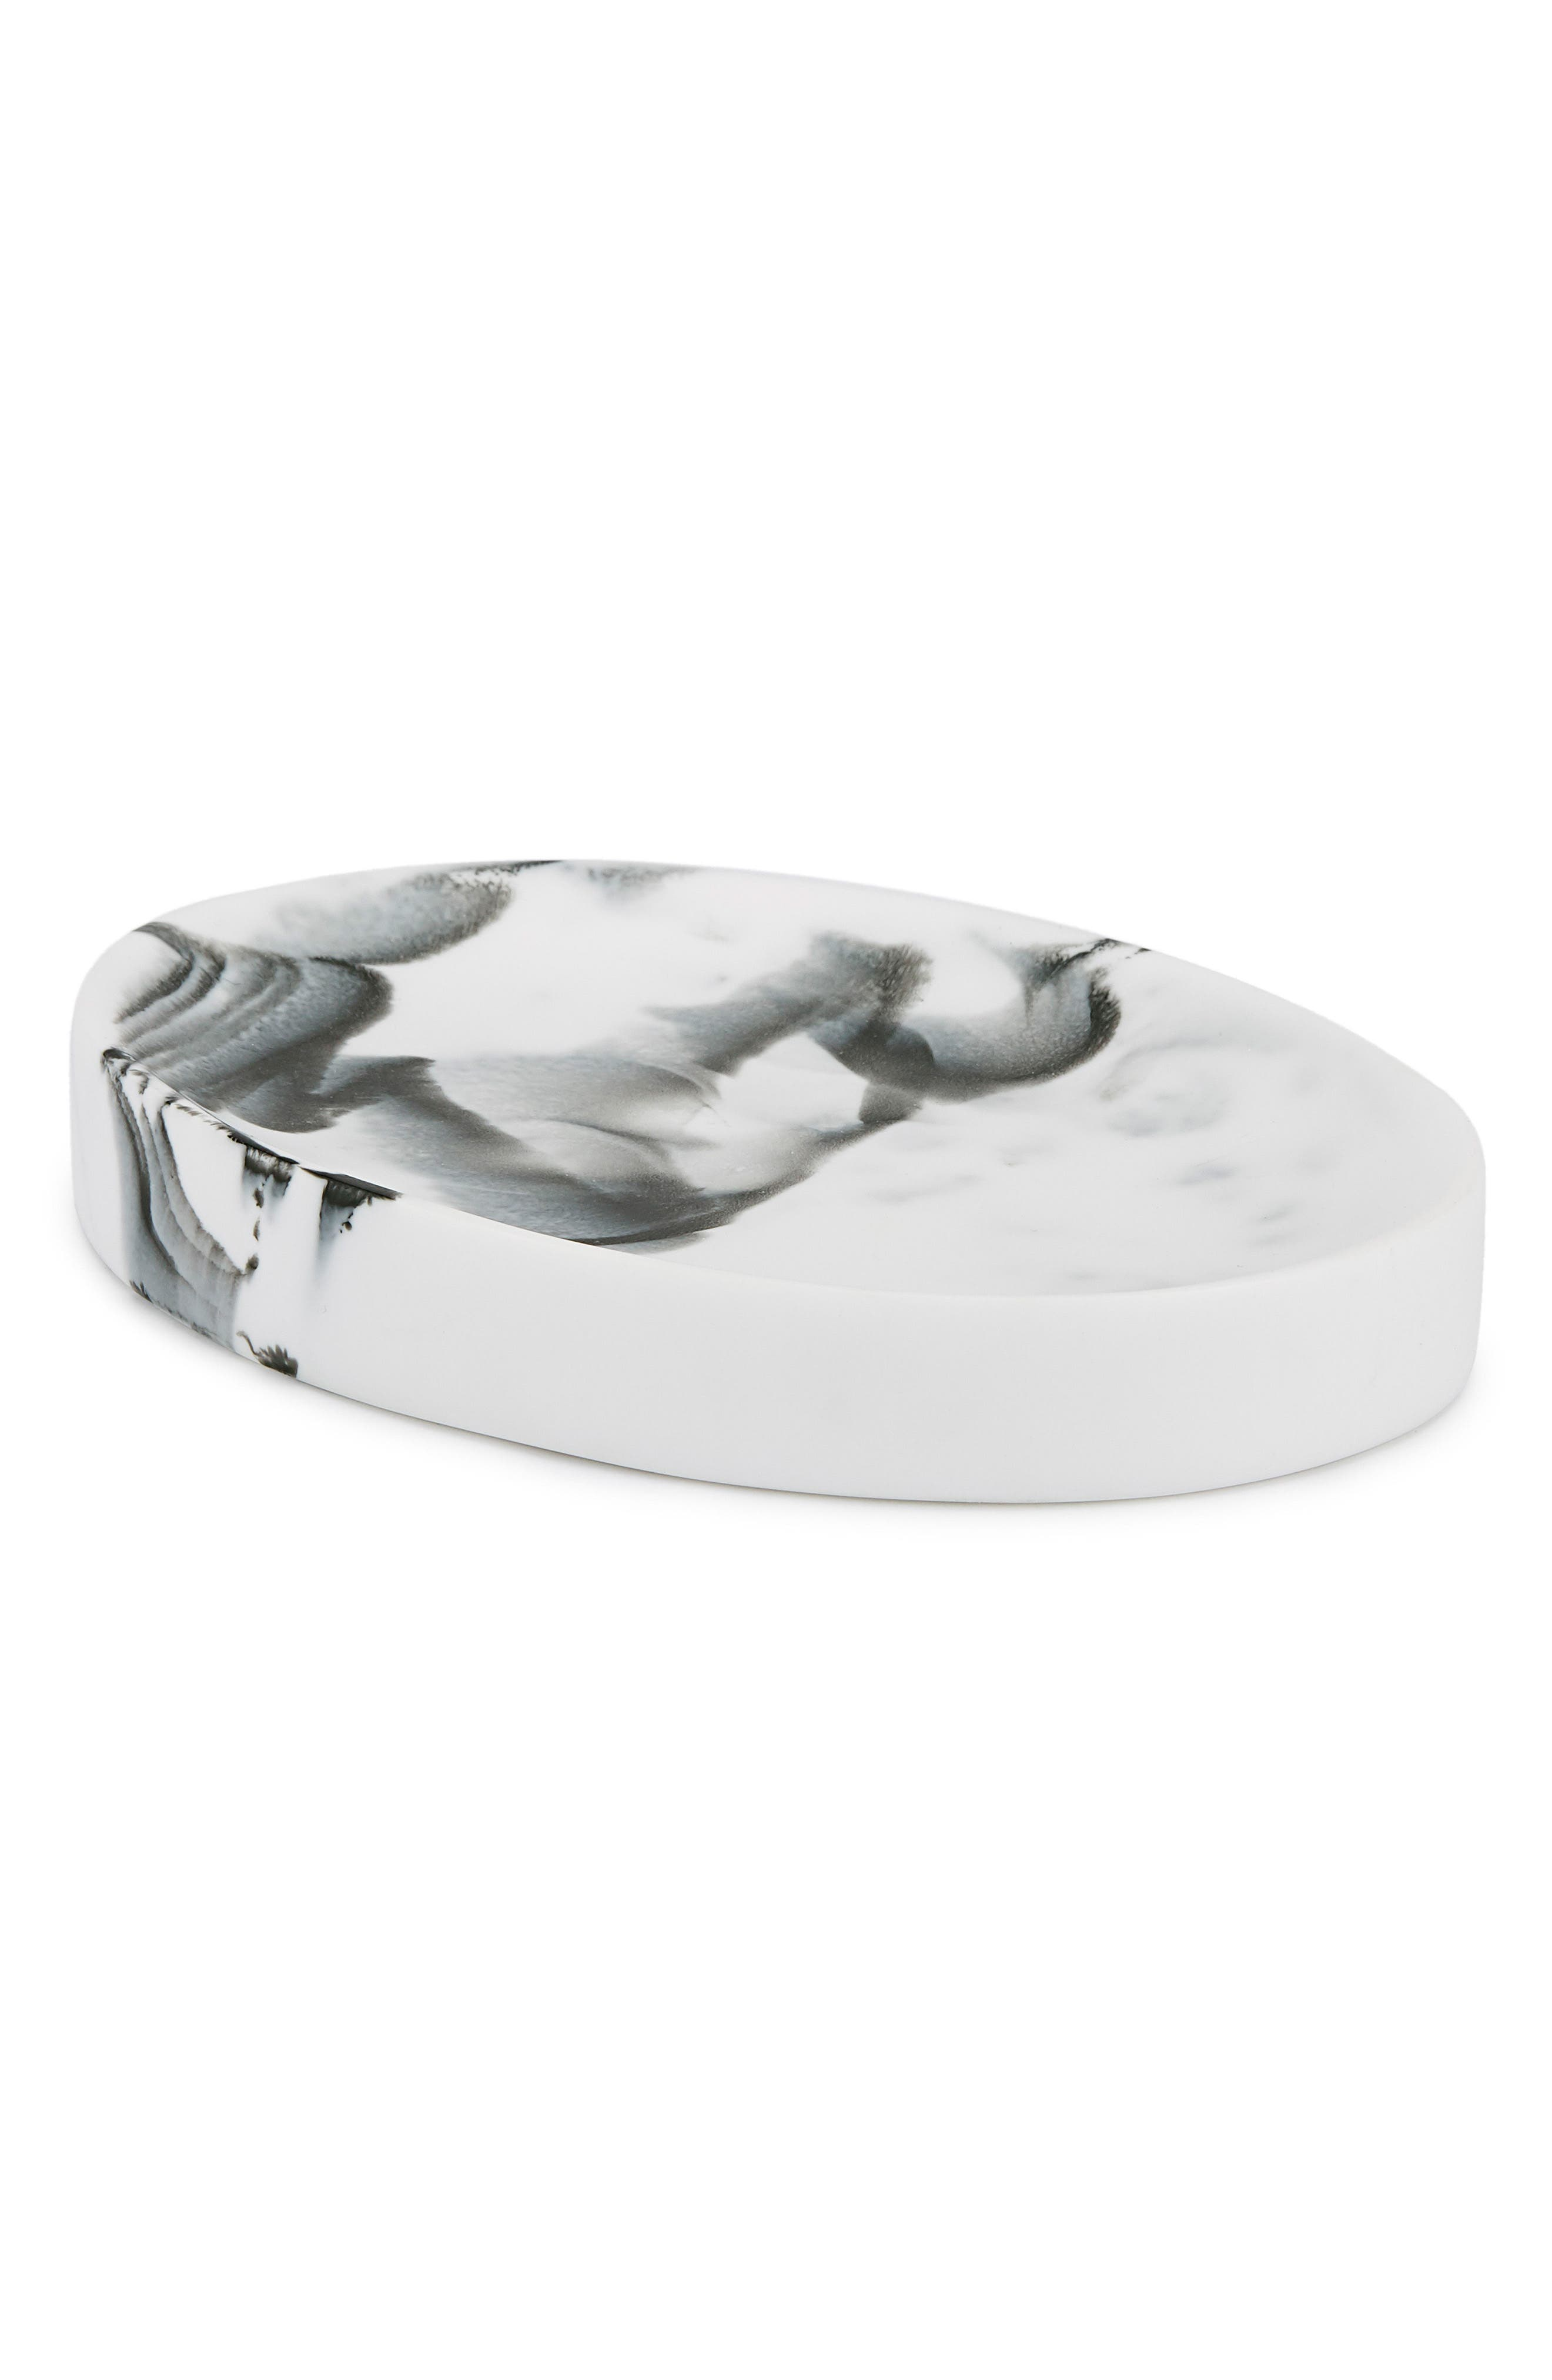 Arabesco Resin Soap Dish,                         Main,                         color, WHITE/ BLACK